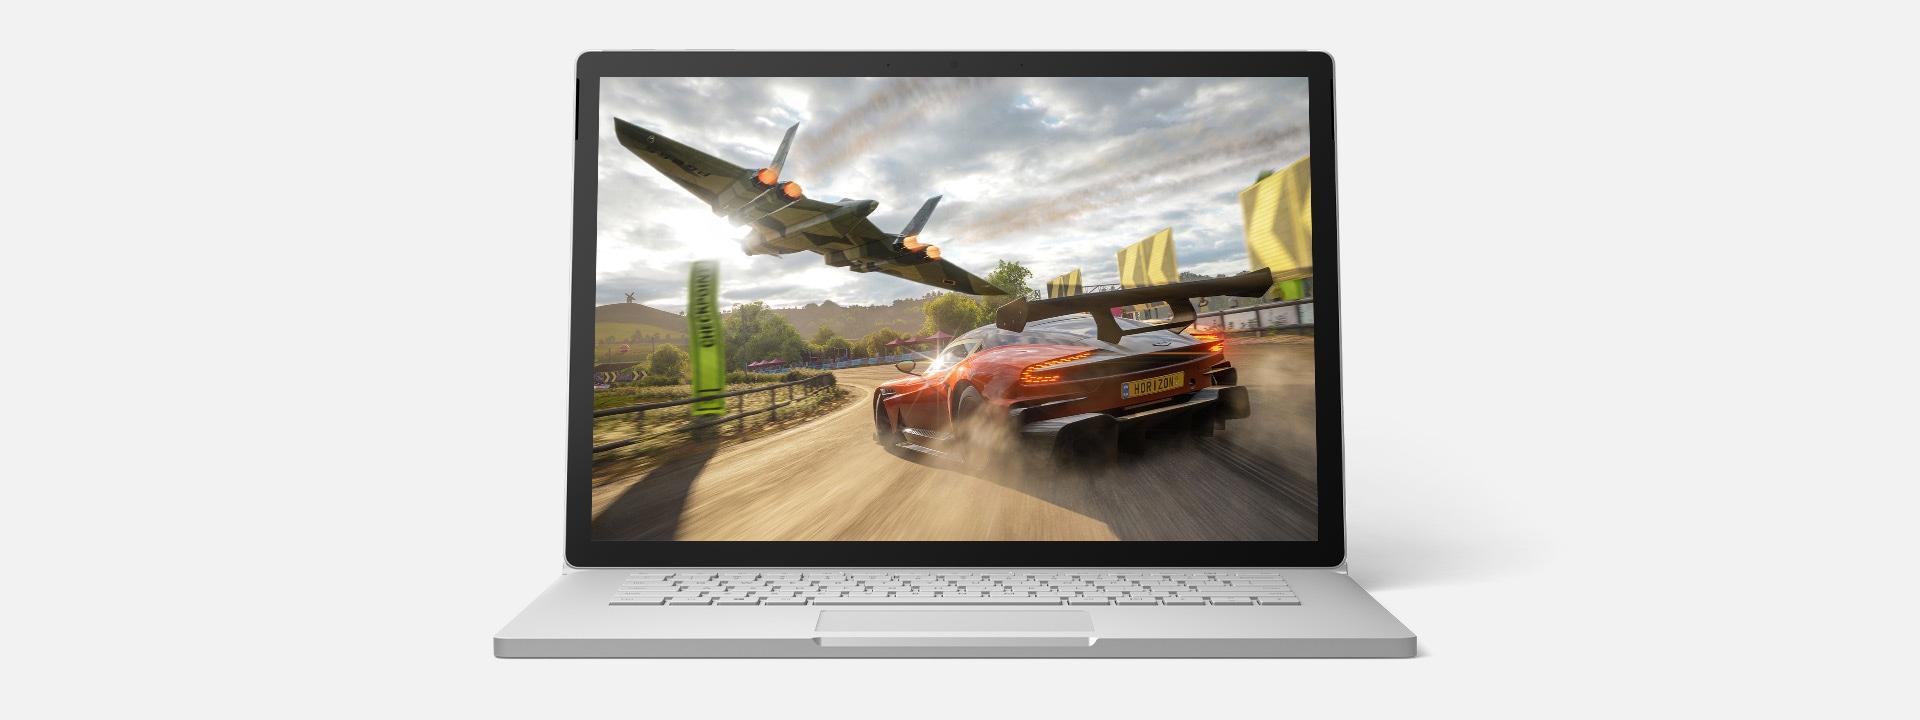 Surface Book 3 在執行 Xbox 遊戲